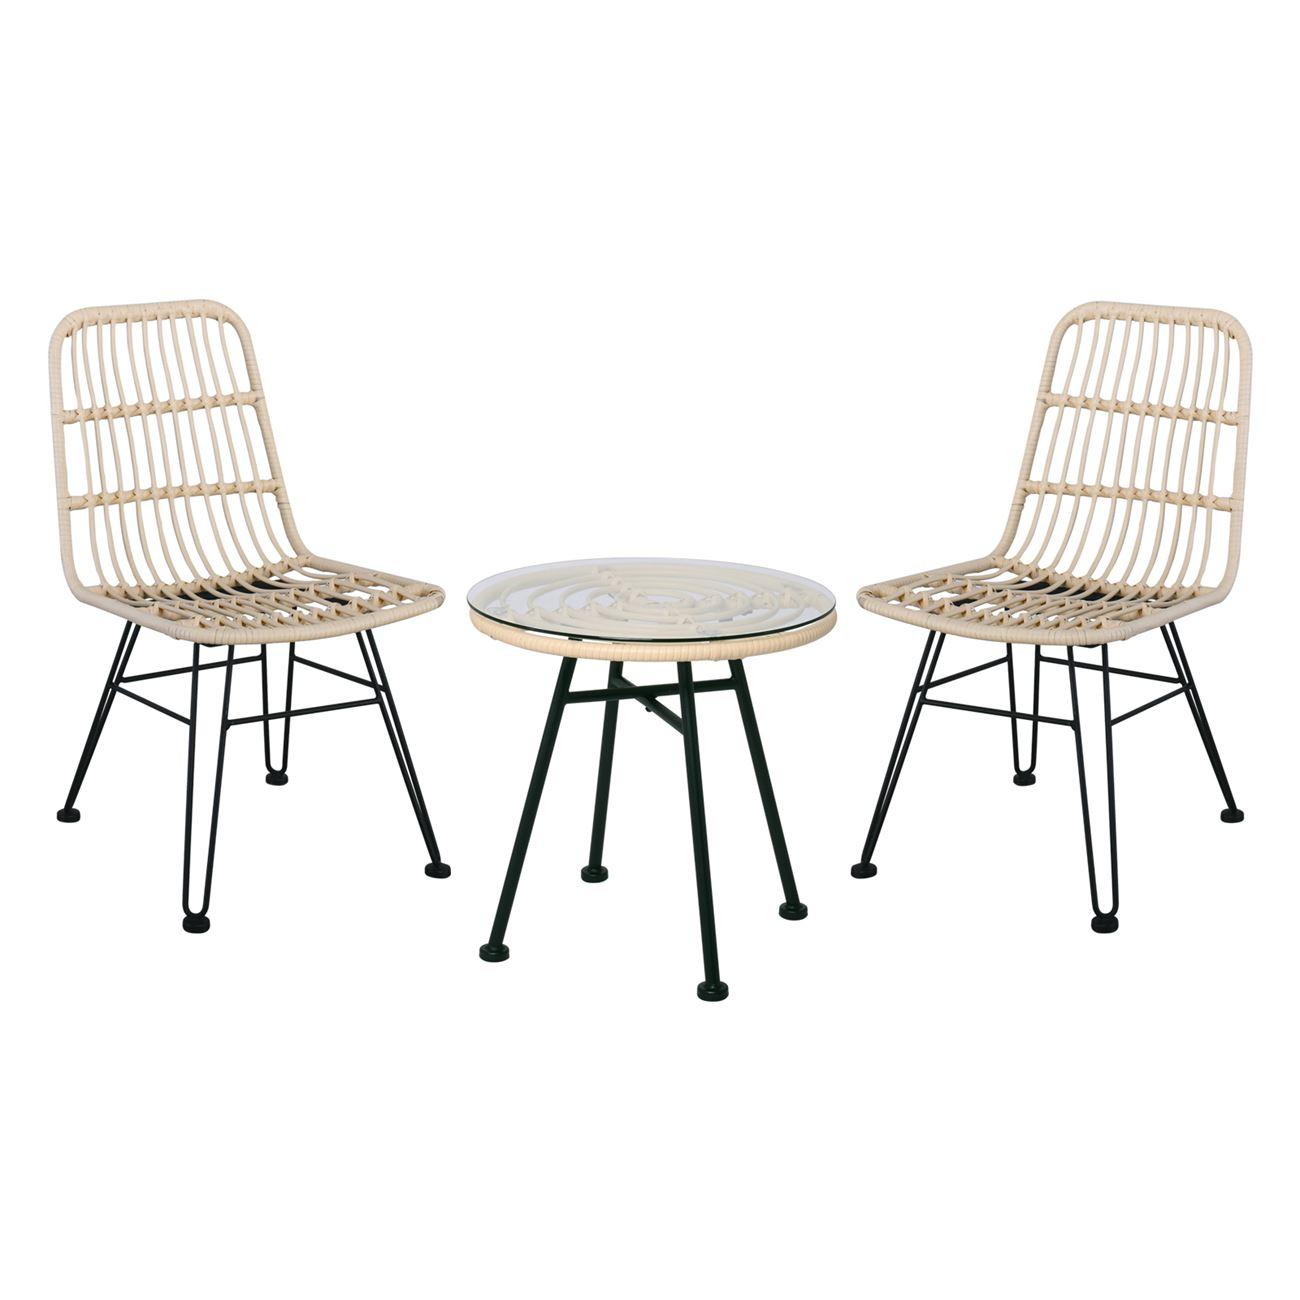 SALSA Set Καρέκλα (Τρ.Φ48cm+2Καρ) Μετ.Μαύρο/Wicker Ivory